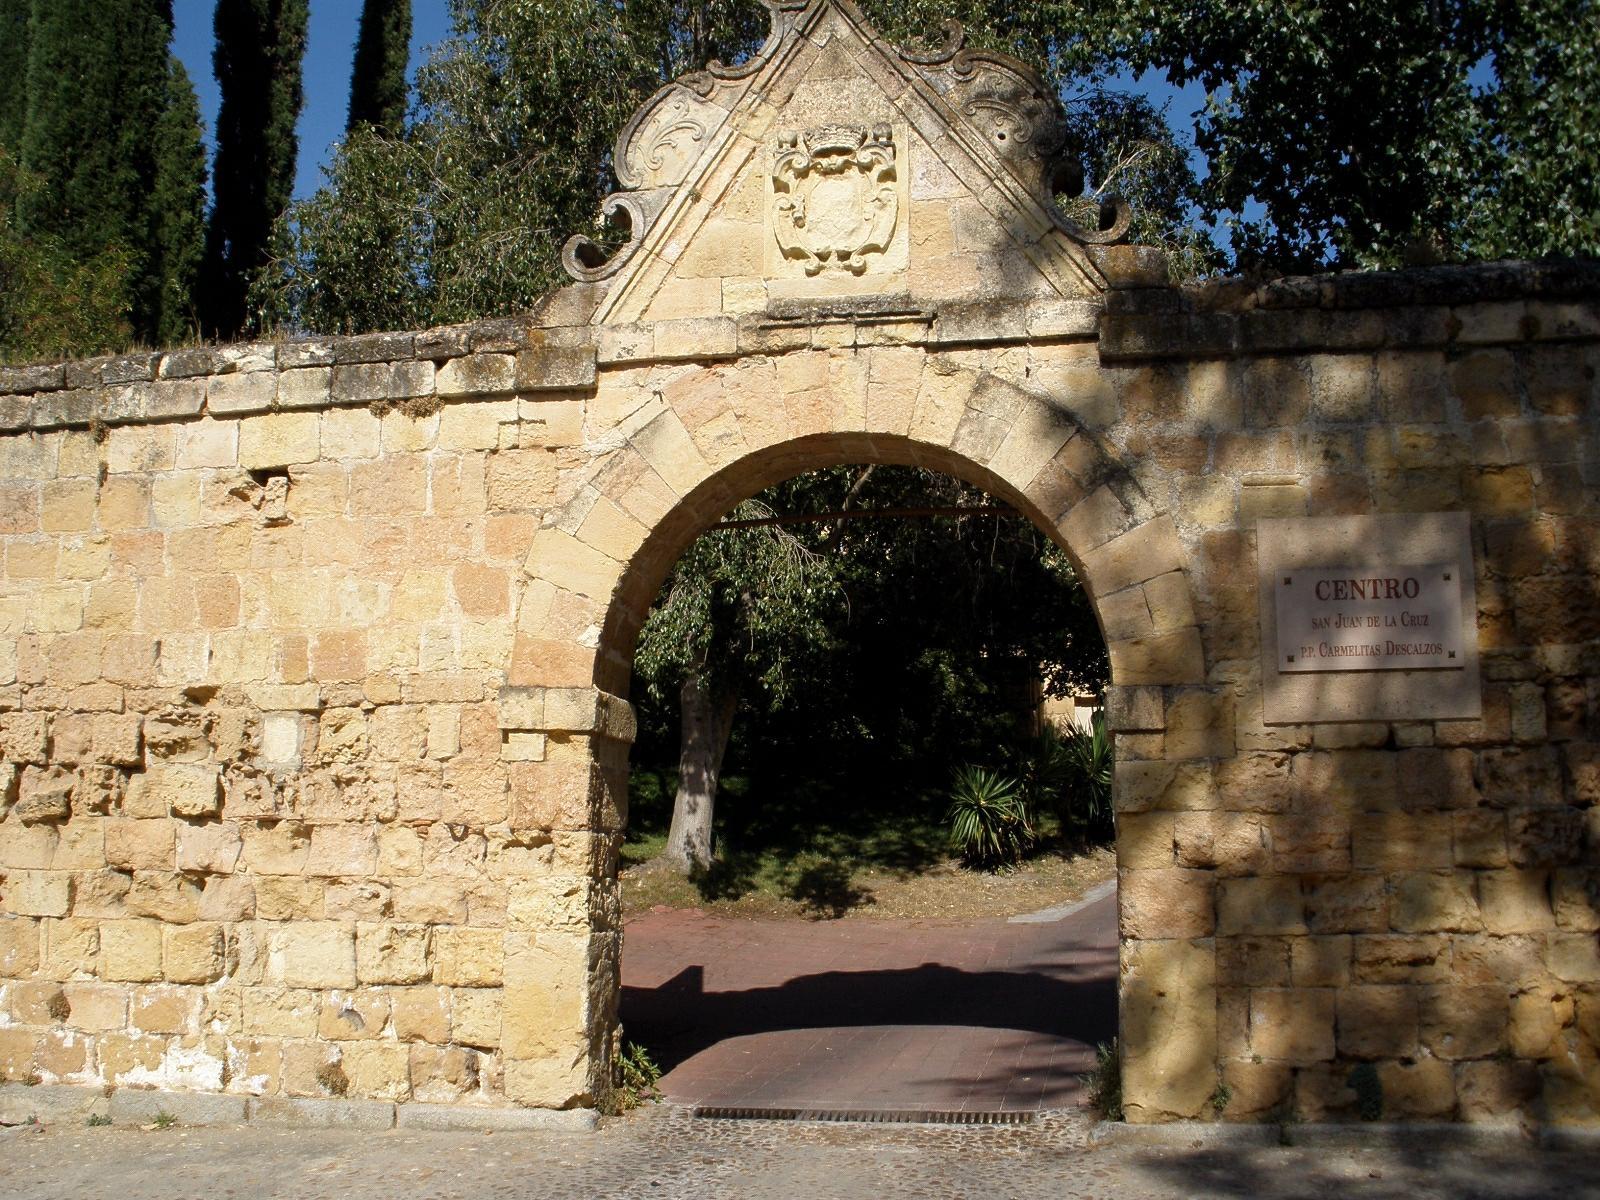 File:Segovia - Convento de los Carmelitas Descalzos 03.jpg